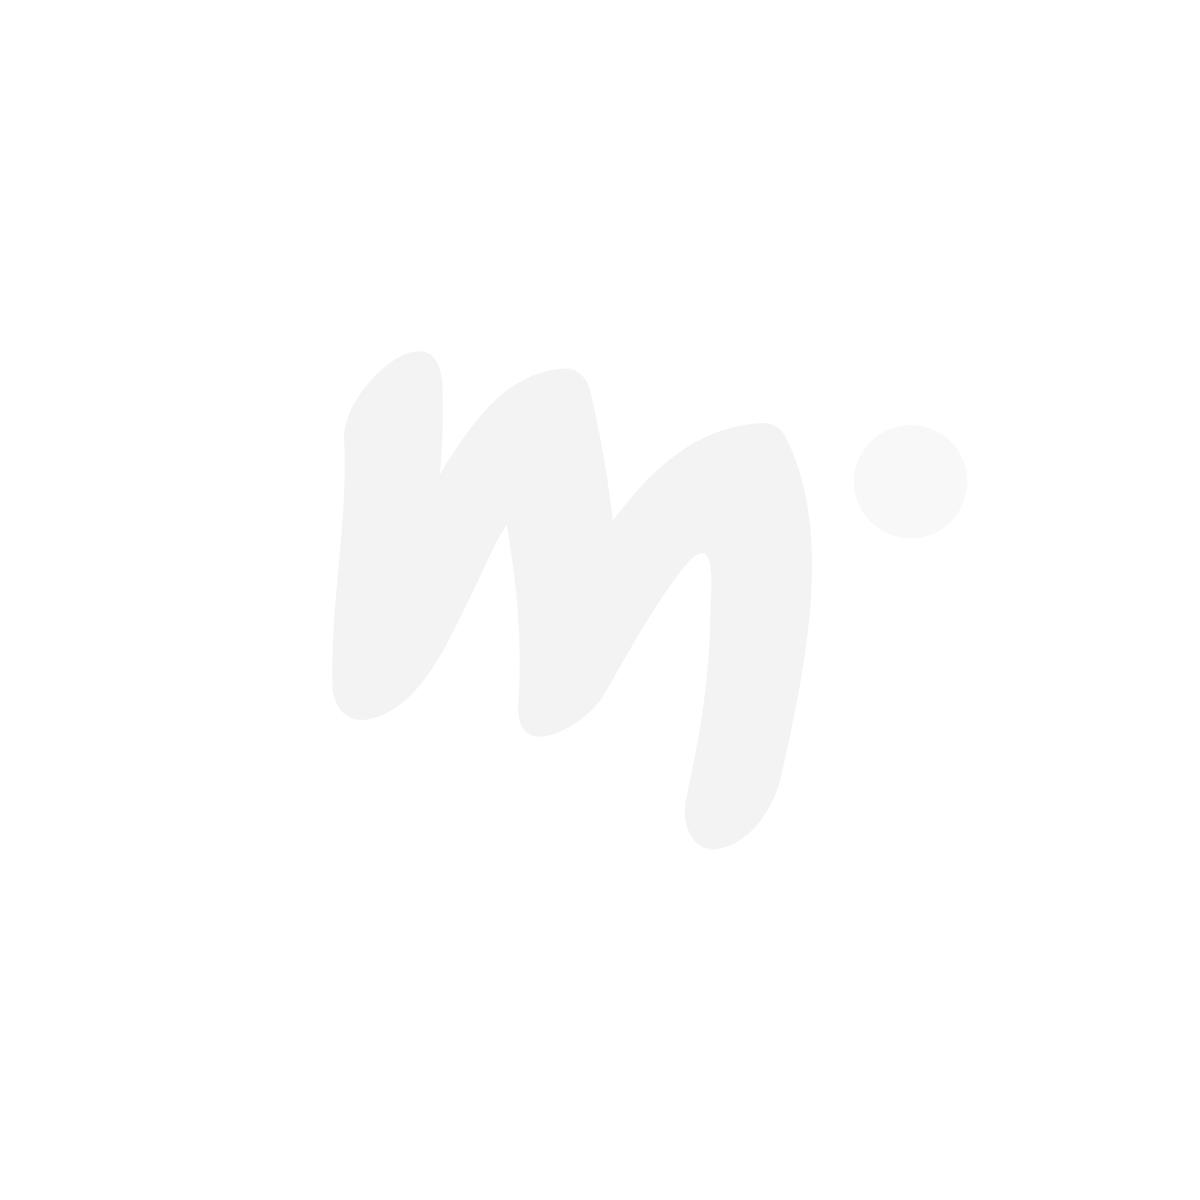 Moomin Figures Spatula L